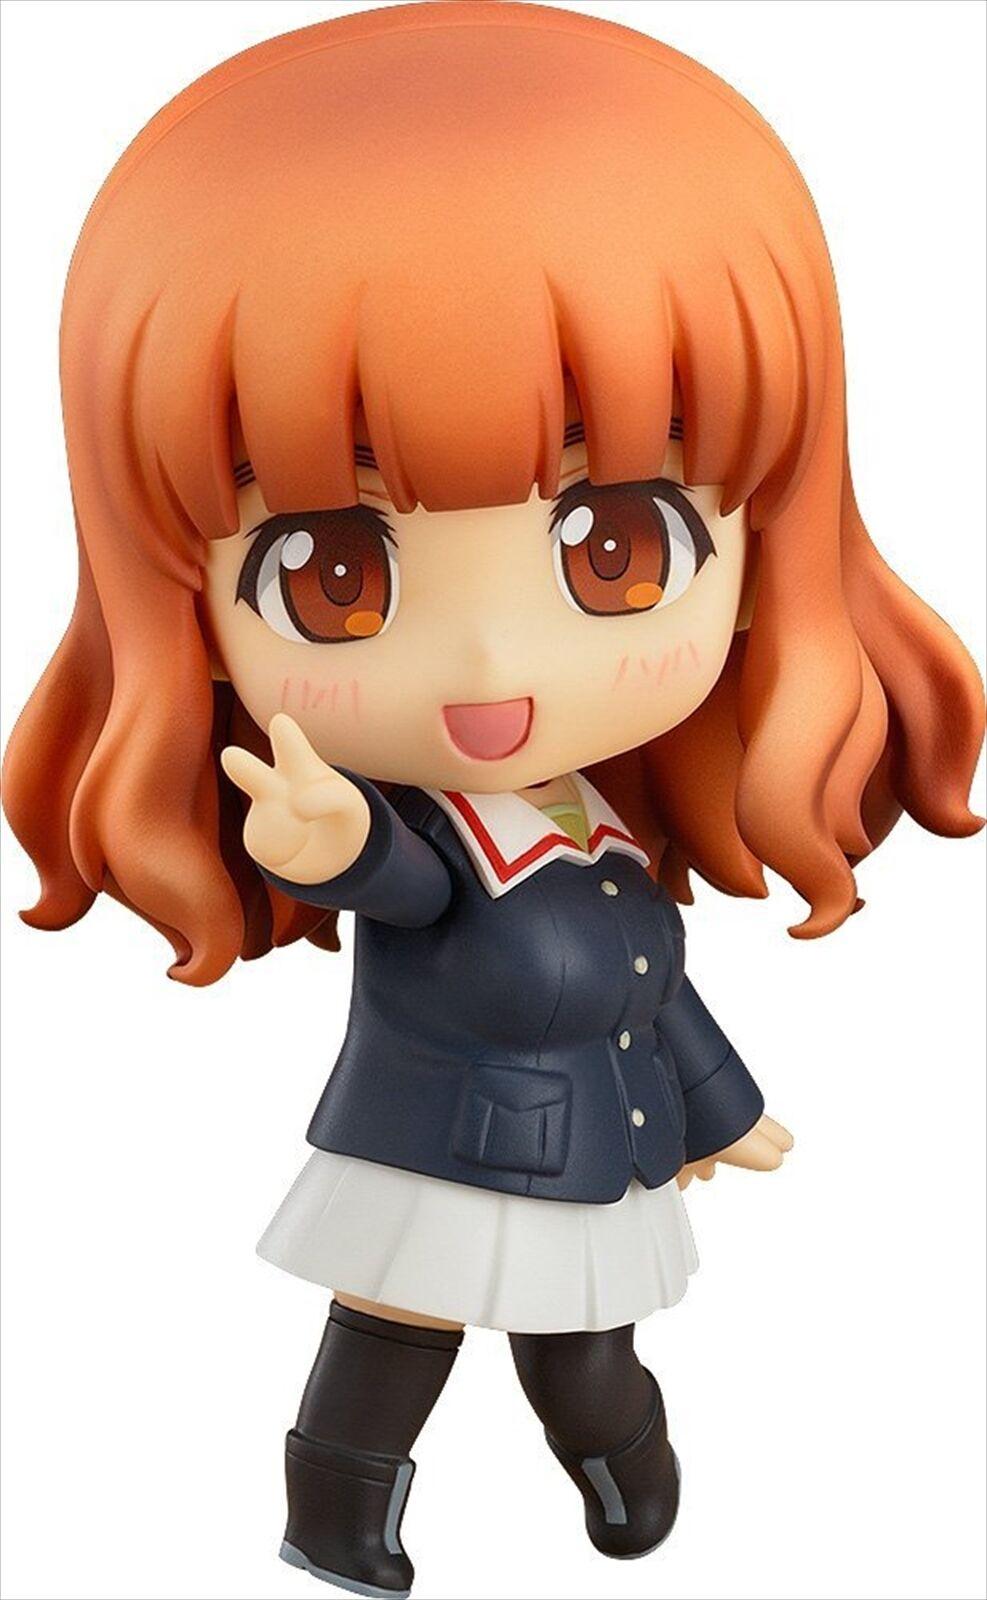 Good Smile Company Nendgoldid Girls und Panzer Saori Takebe Action Action Action Figure a35514